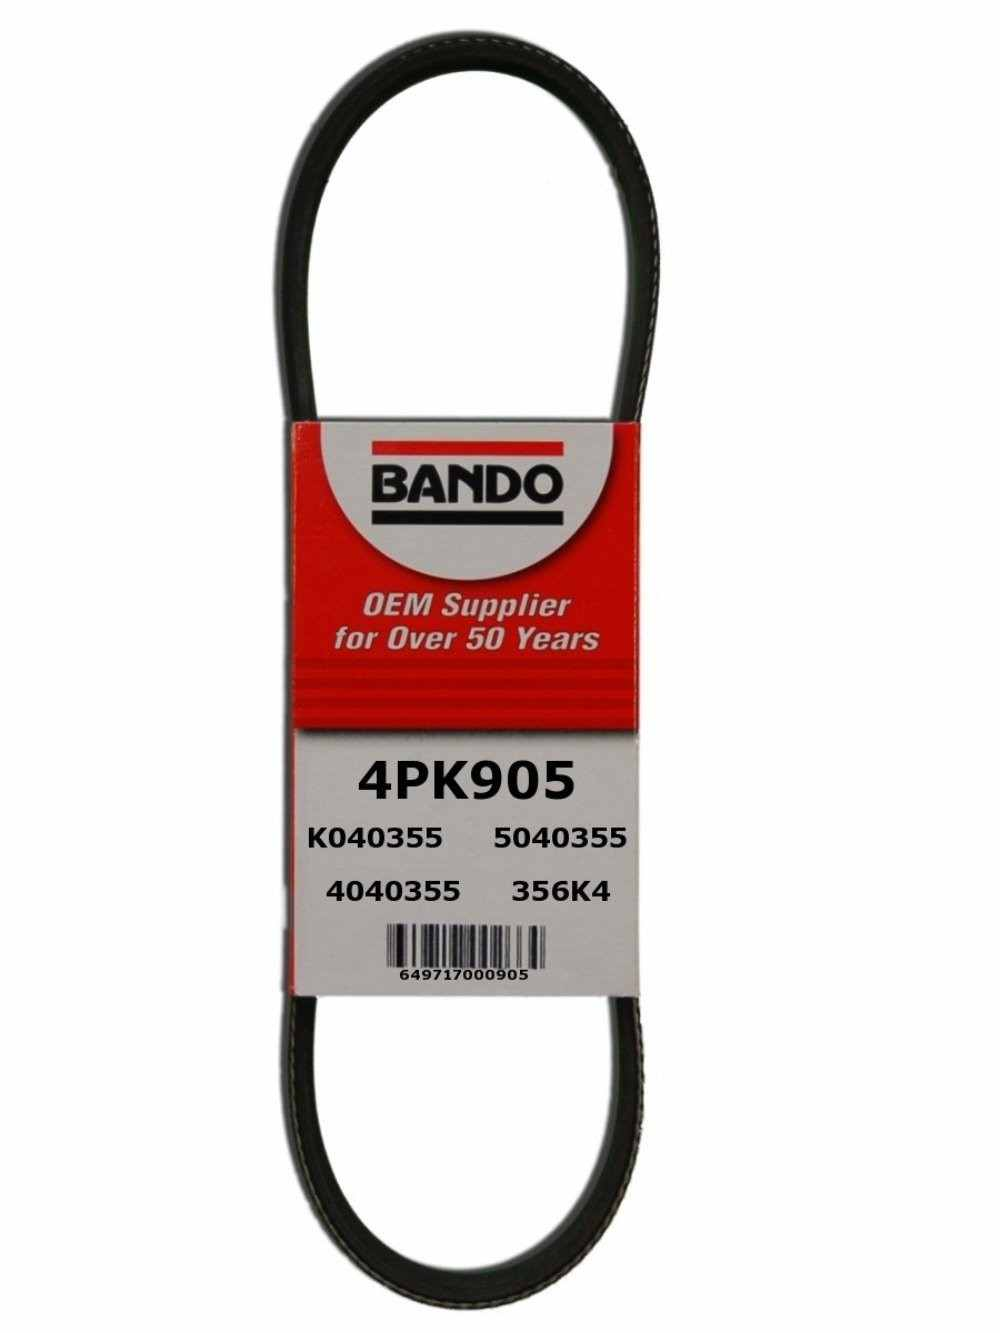 BANDO - Rib Ace Precision Engineered V-Ribbed Belt (Air Conditioning) - BWO 4PK905